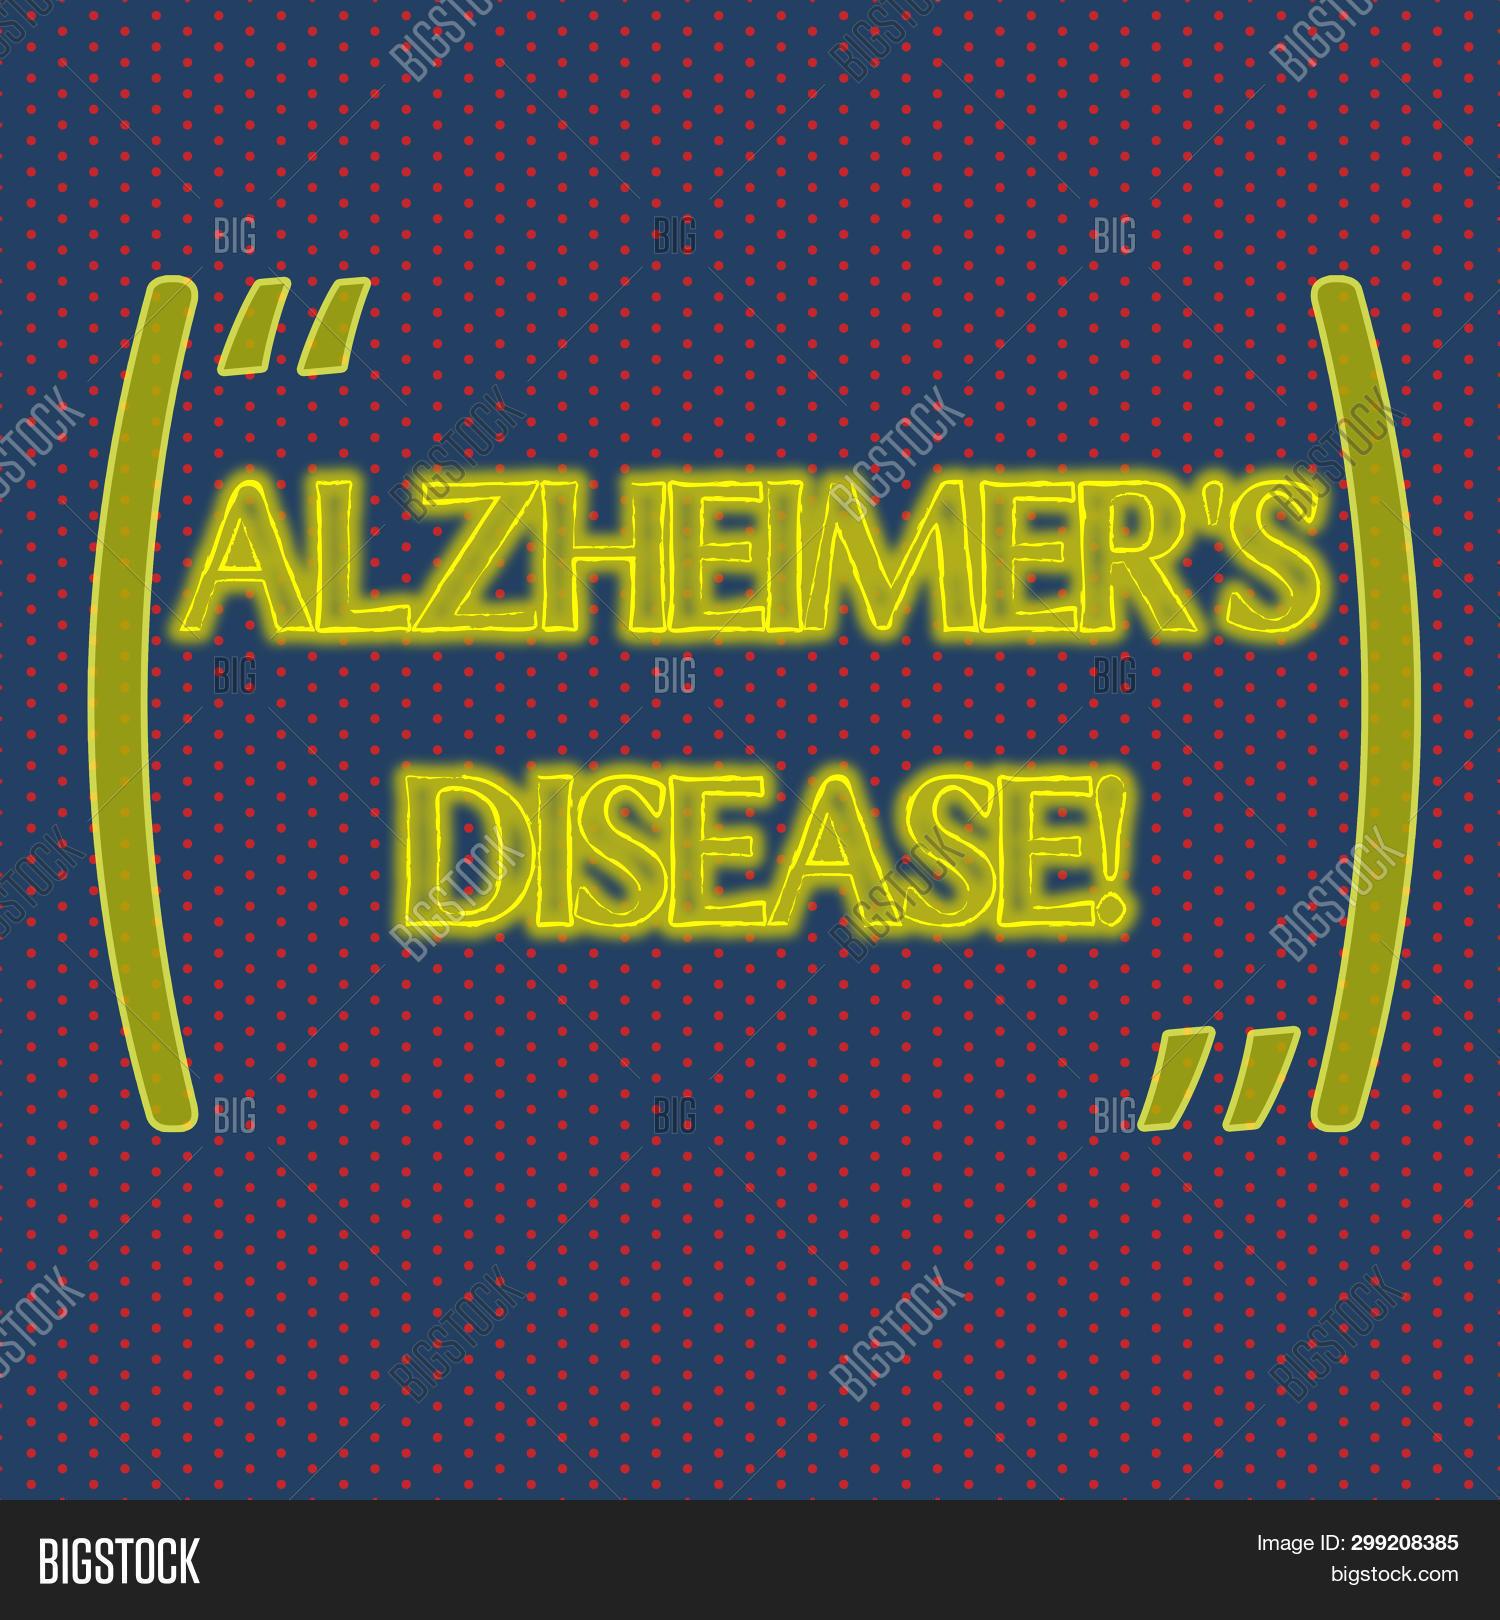 aging,alzheimer,anatomy,attention,brain,care,caregiver,concept,confuse,confusion,cure,danger,day,dementia,demonstrating,depression,disability,disease,emotional,forgot,health,illness,intelligence,loss,medicine,memory,mental,mind,neurology,old,pain,parkinson,patient,pensioner,problem,psychology,remember,sadness,senior,showing,wrinkles